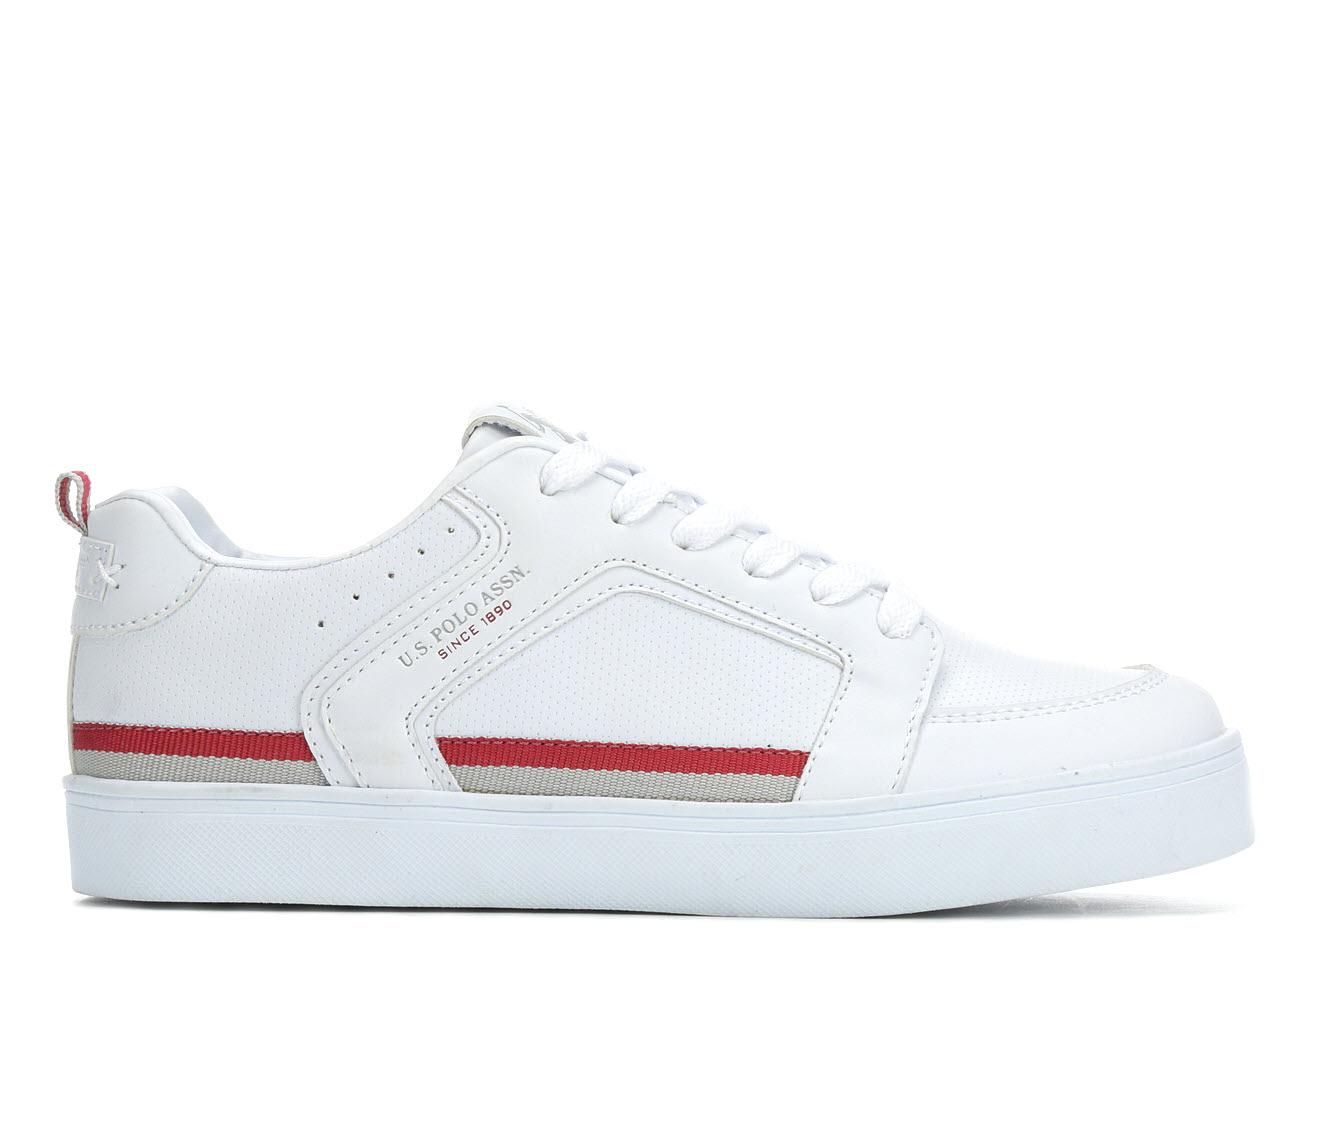 US Polo Assn Prime Women's Shoe (White Faux Leather)